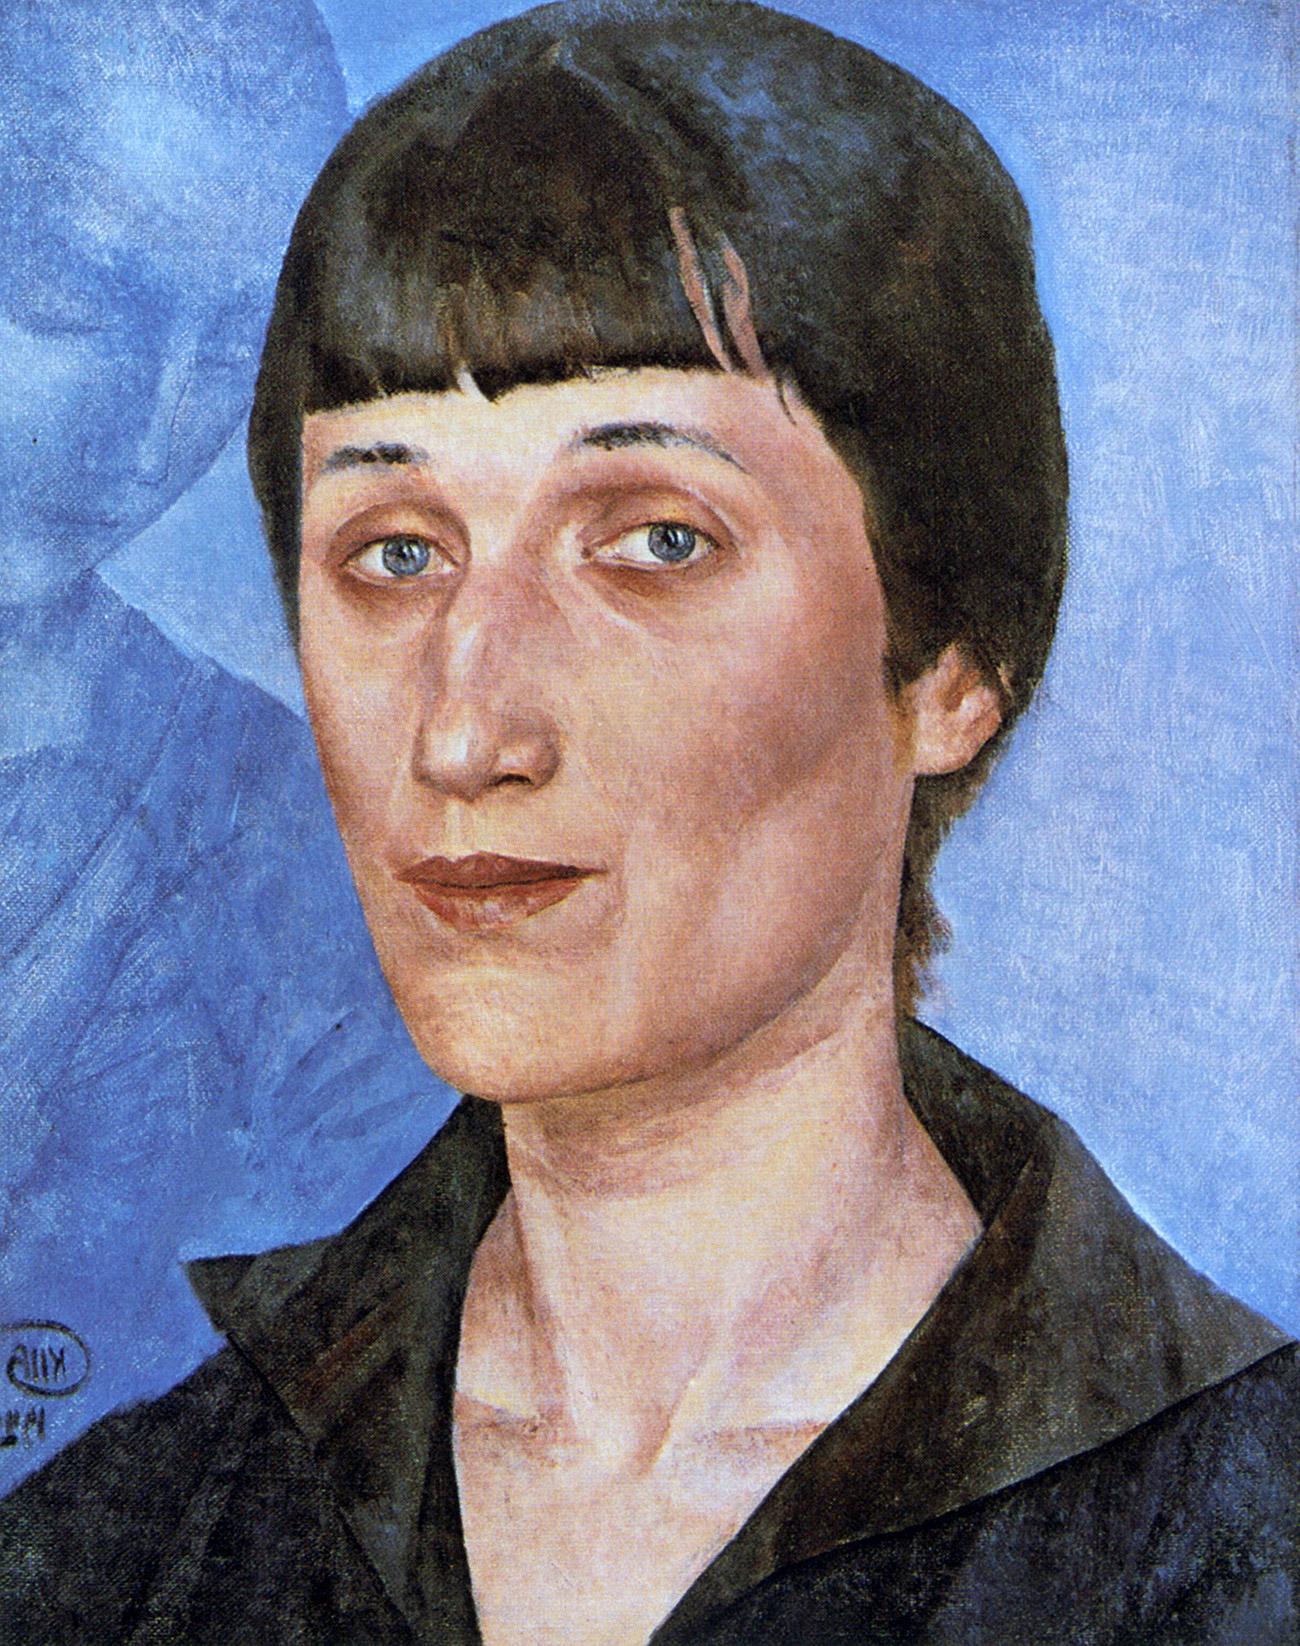 Portrait of Anna Akhmatova by Kuzma Petrov-Vodkin. Source: Poetry Literature/Global Look Press